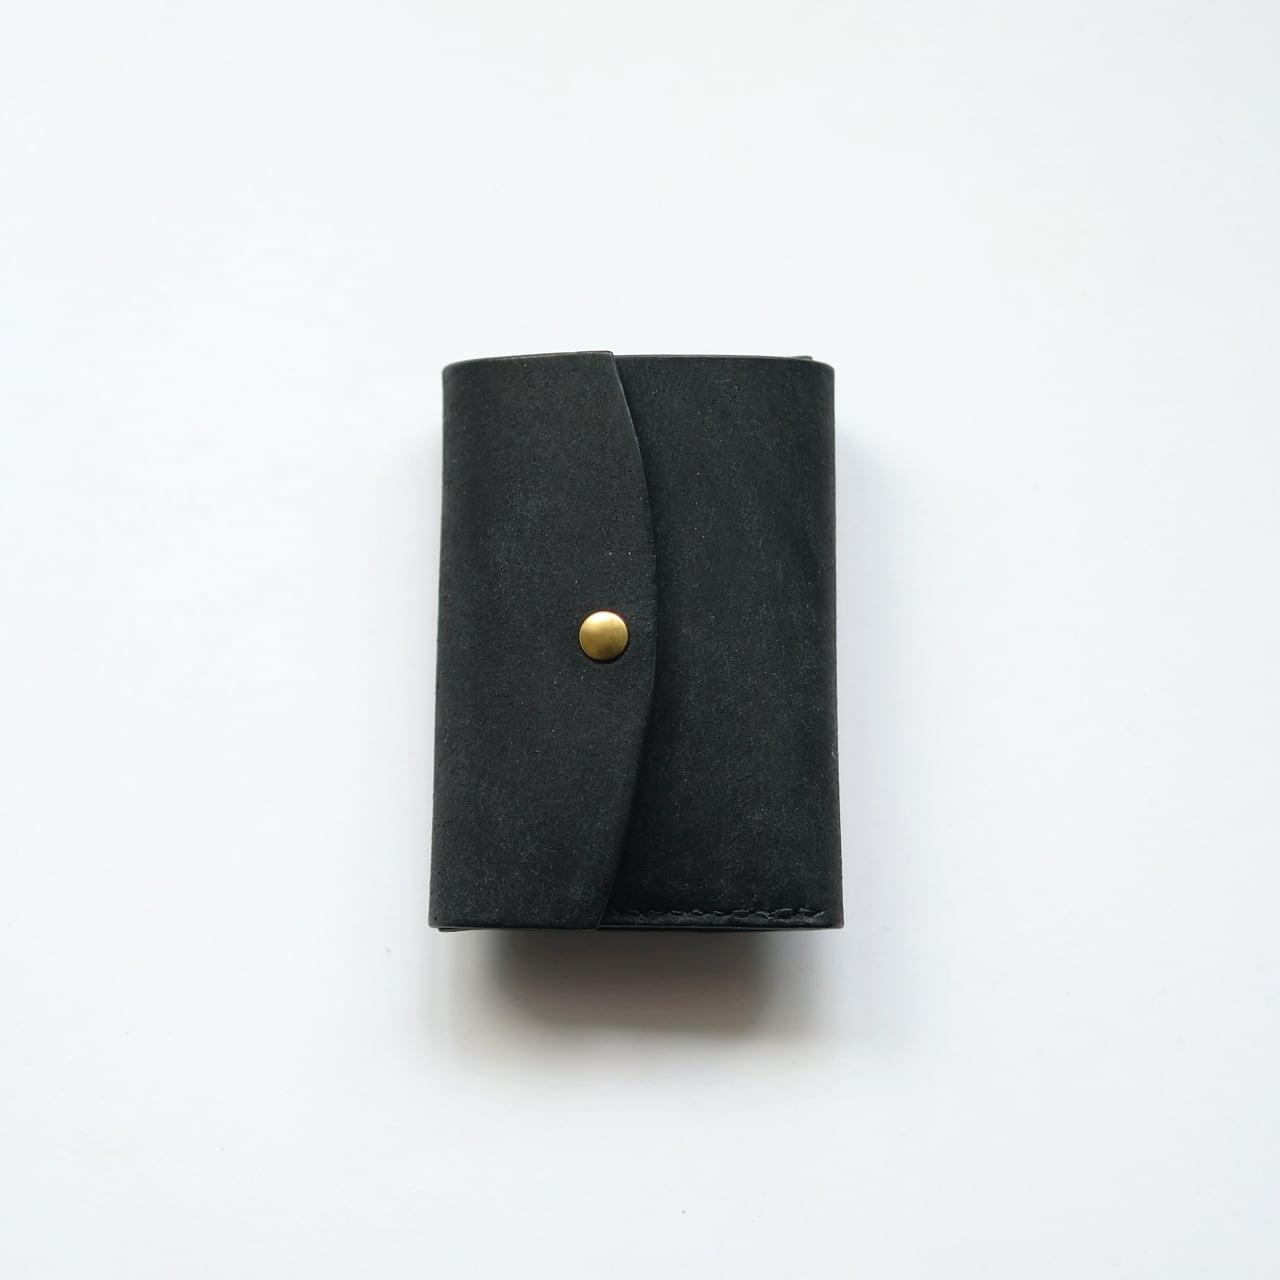 tri-fold wallet - bk - プエブロ